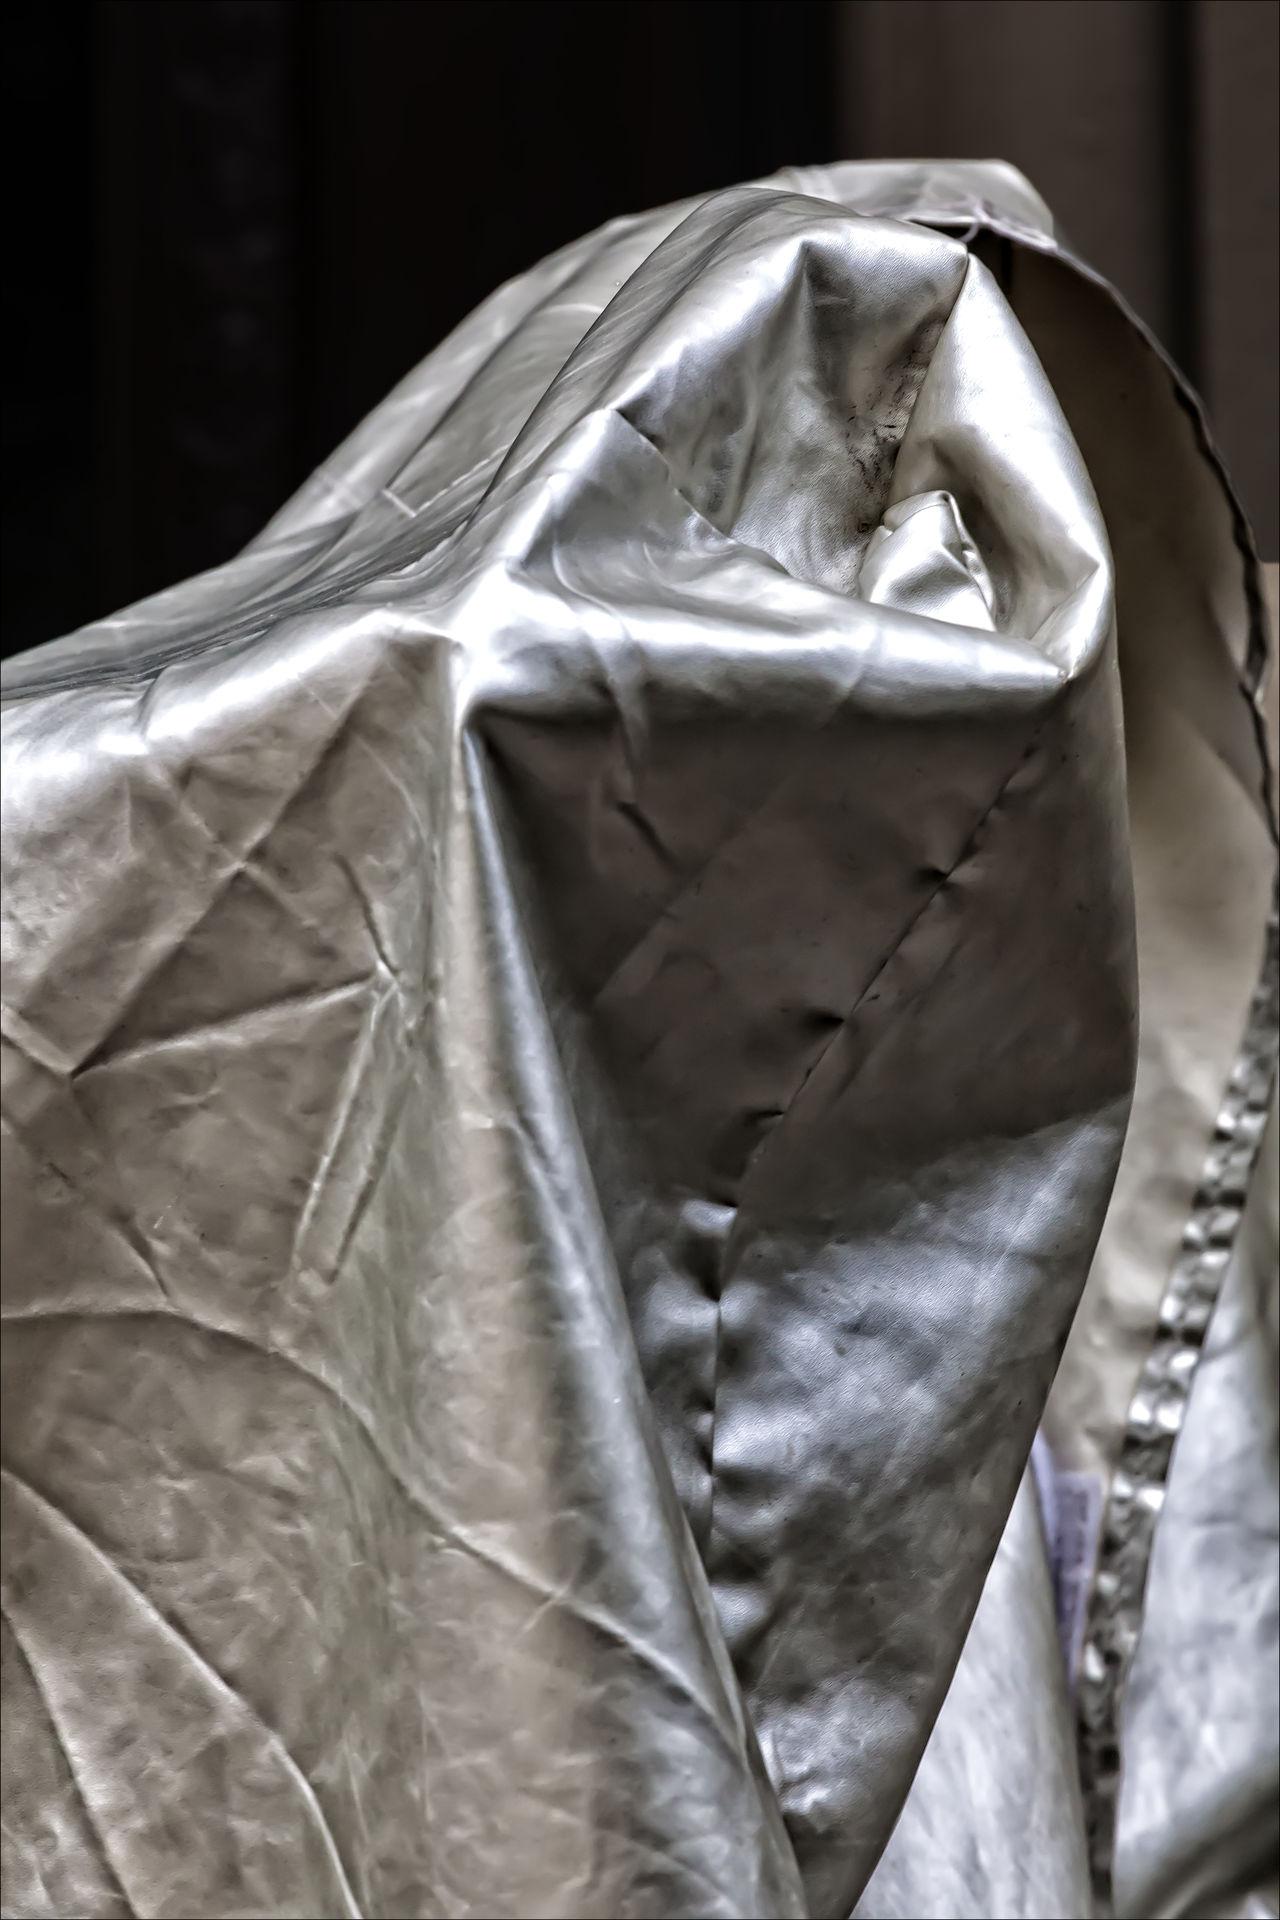 Motorcycle Tarp Motorcycle Tarpaulin Reflective Fabric Still Life Tarpaulin